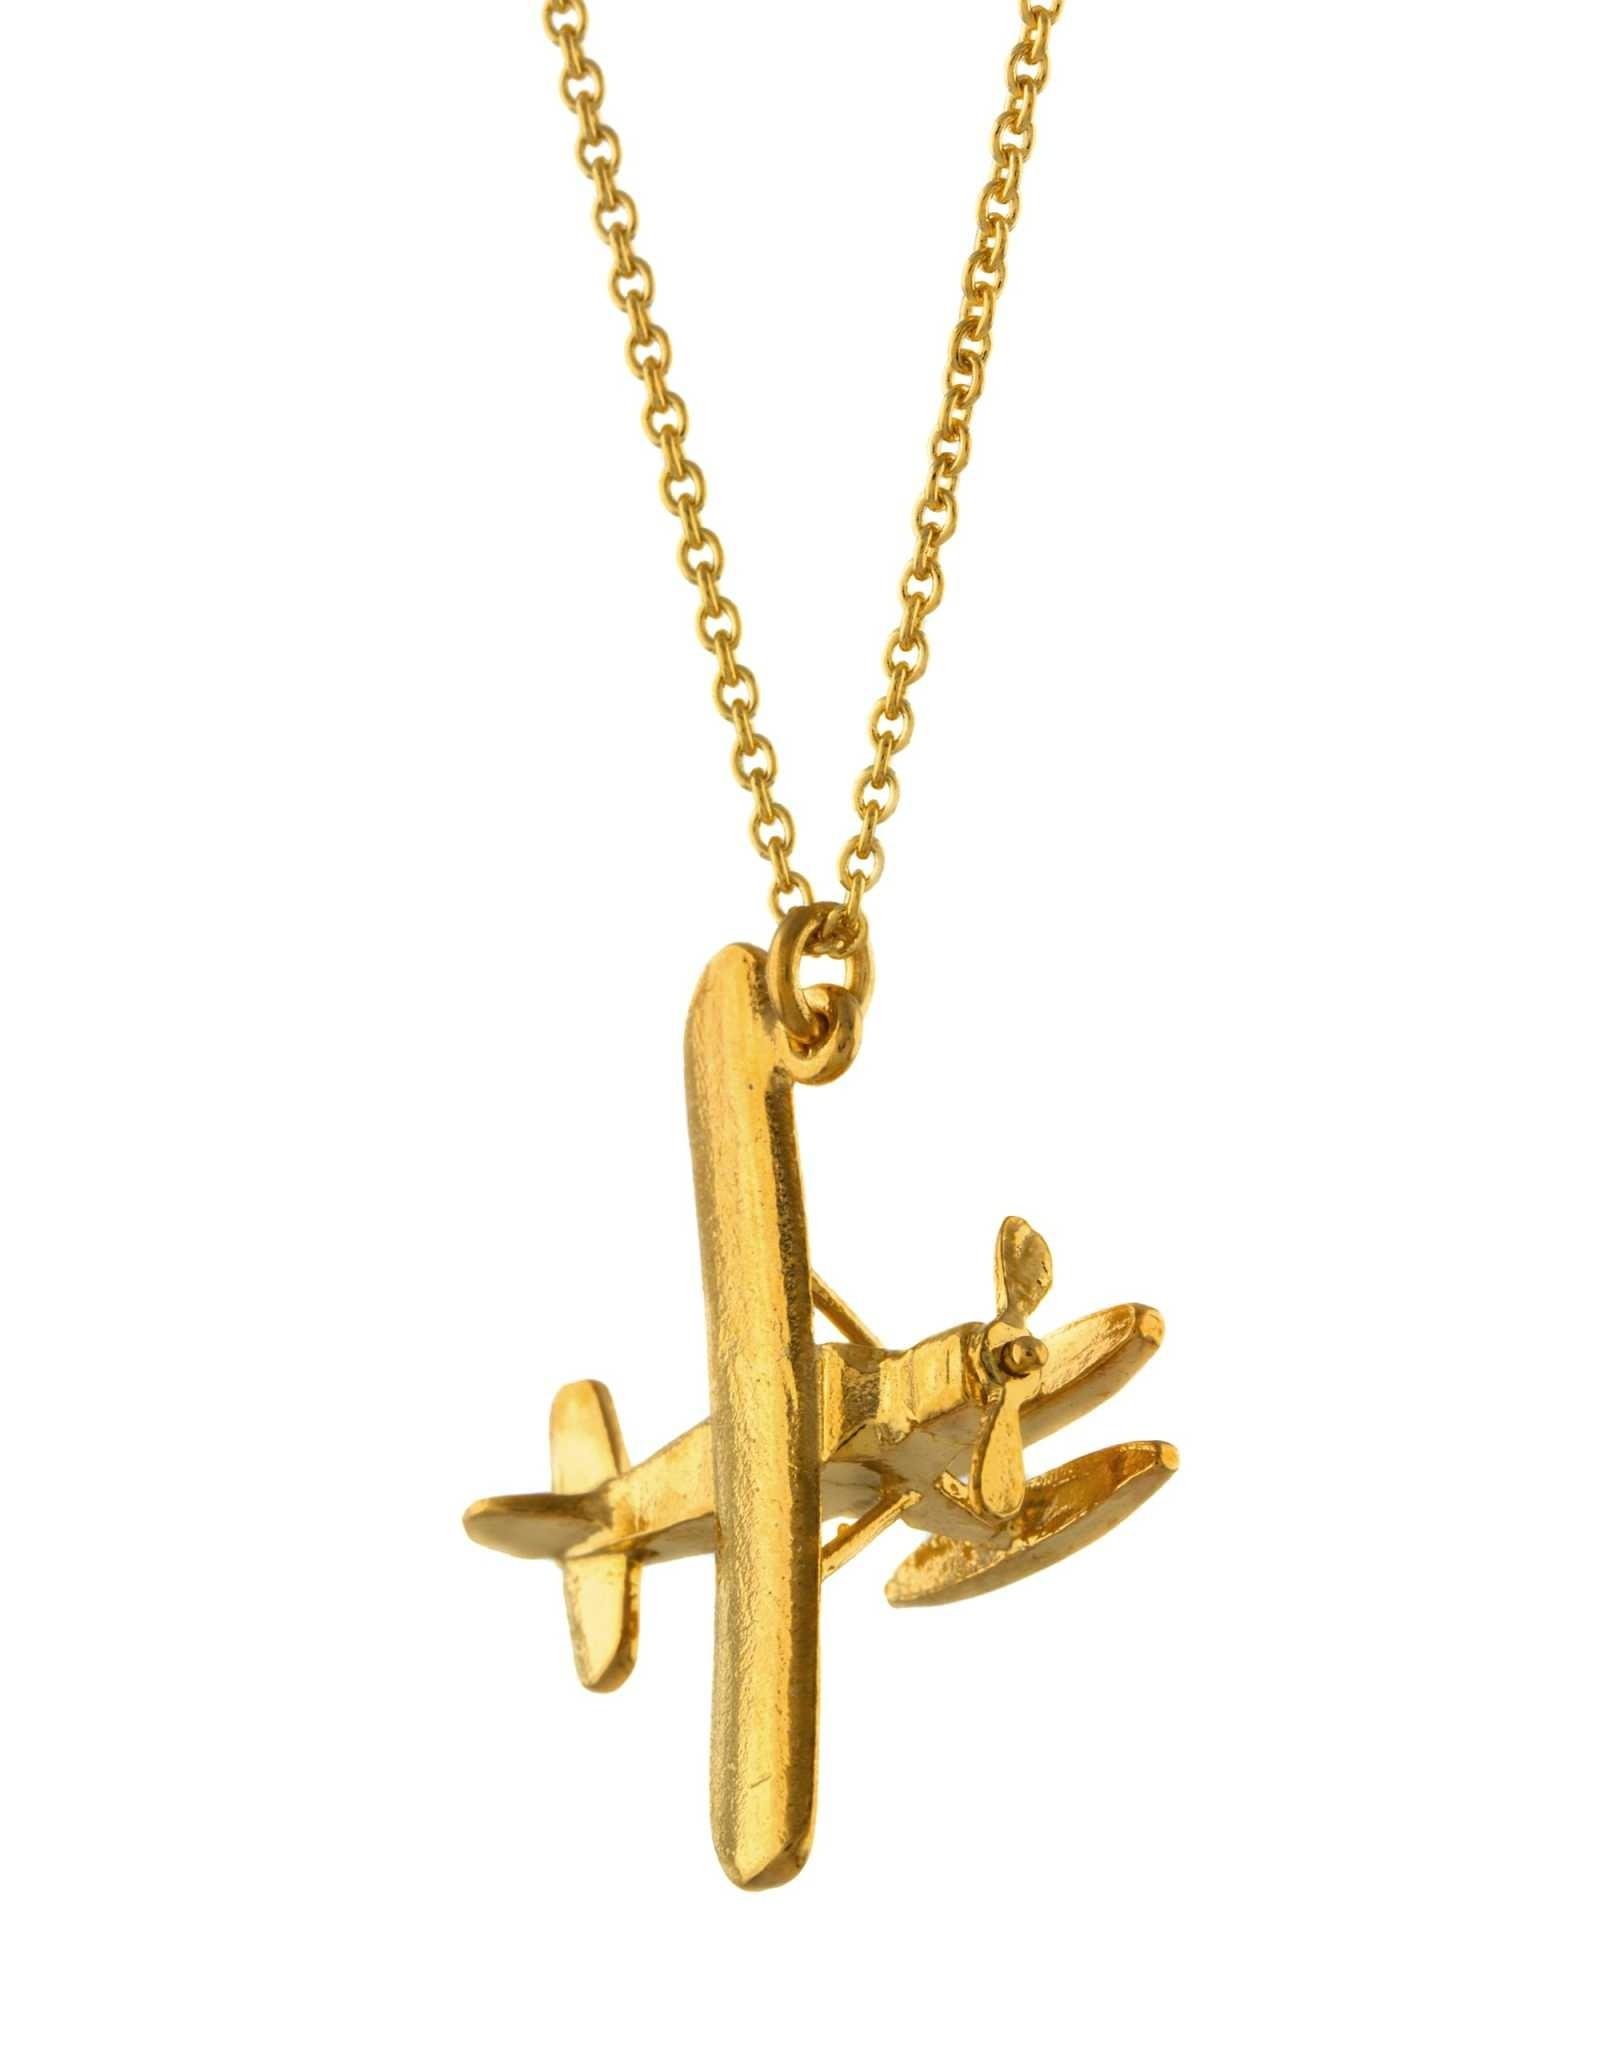 Alex Monroe Seaplane Necklace